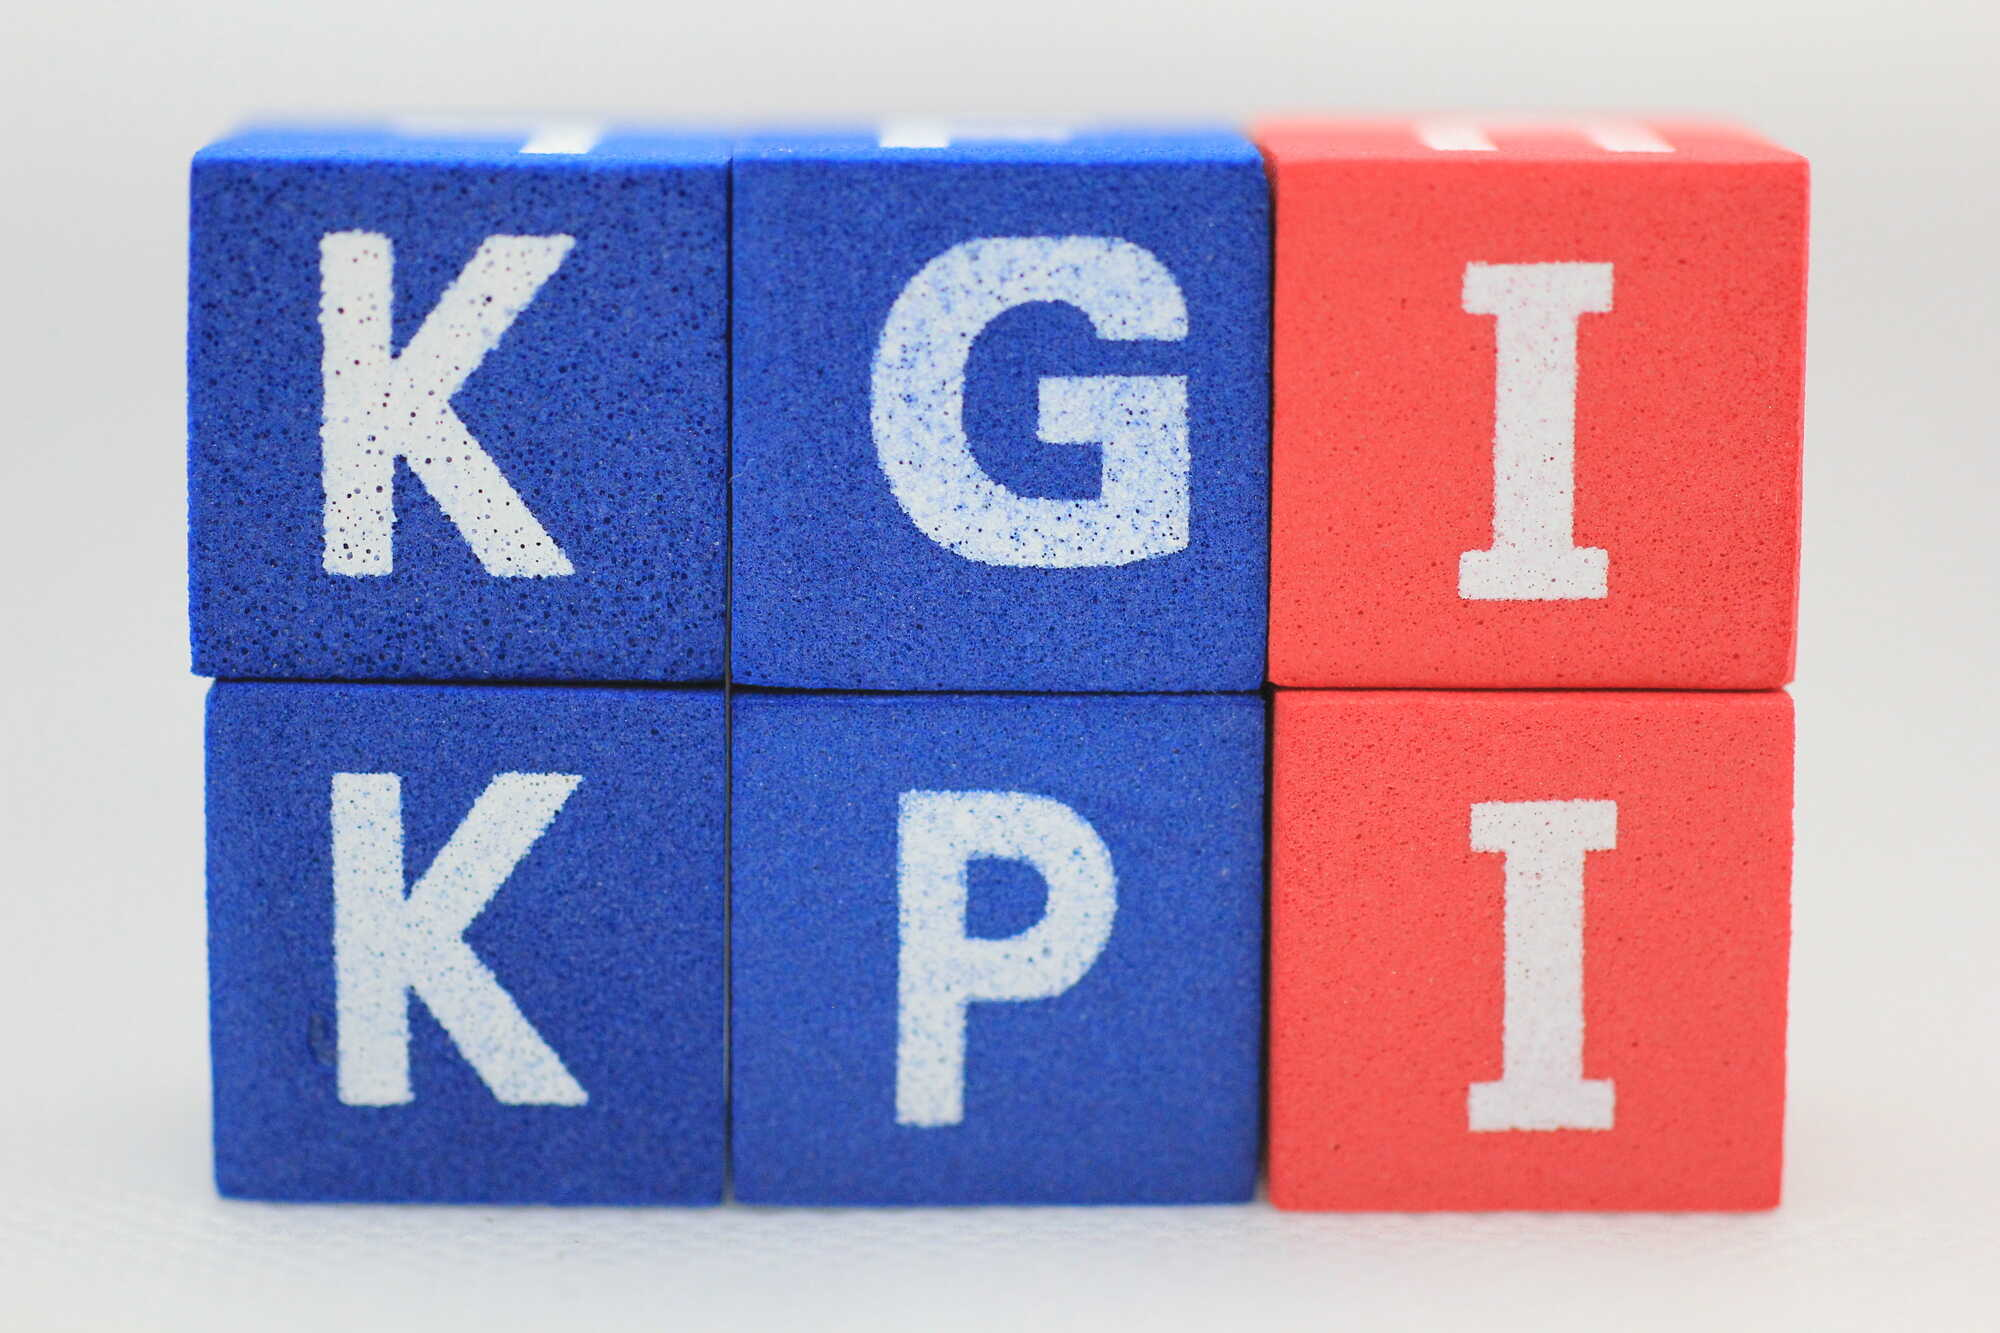 KPIマネジメントに関する4つの基礎用語、KGI/KSF/KPI/KAI